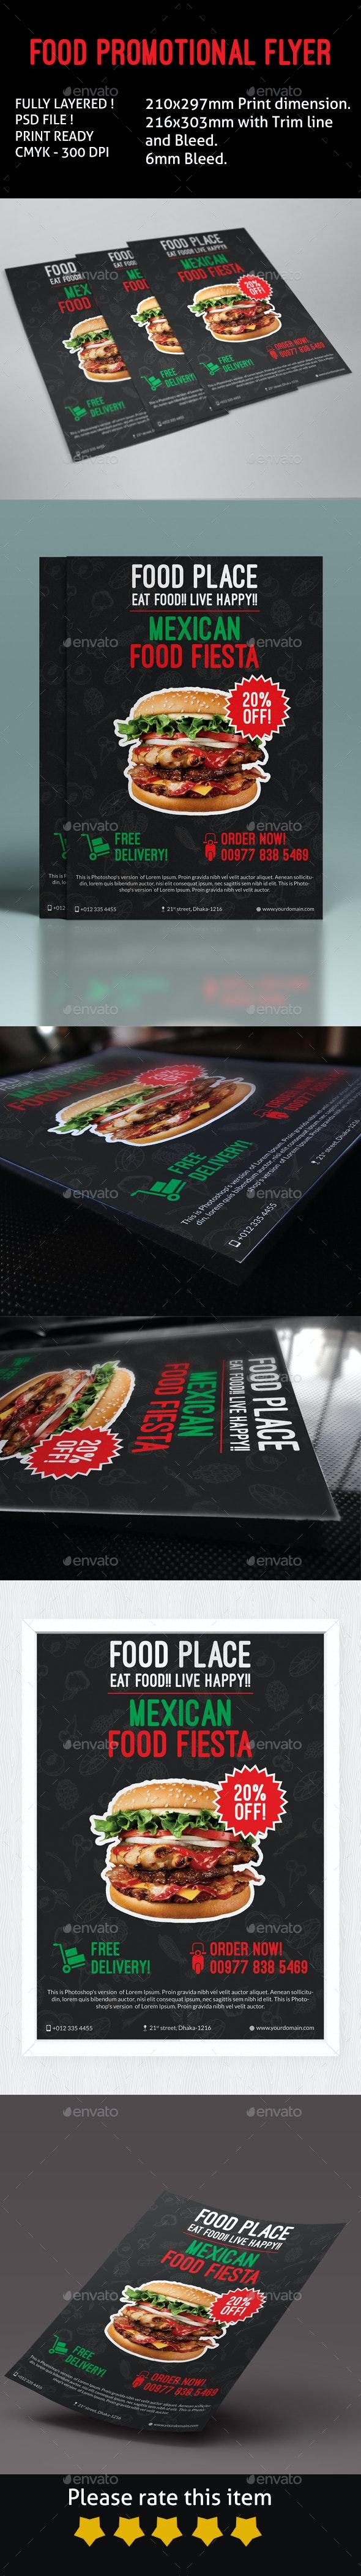 Food Promotional Flyer - Restaurant Flyers